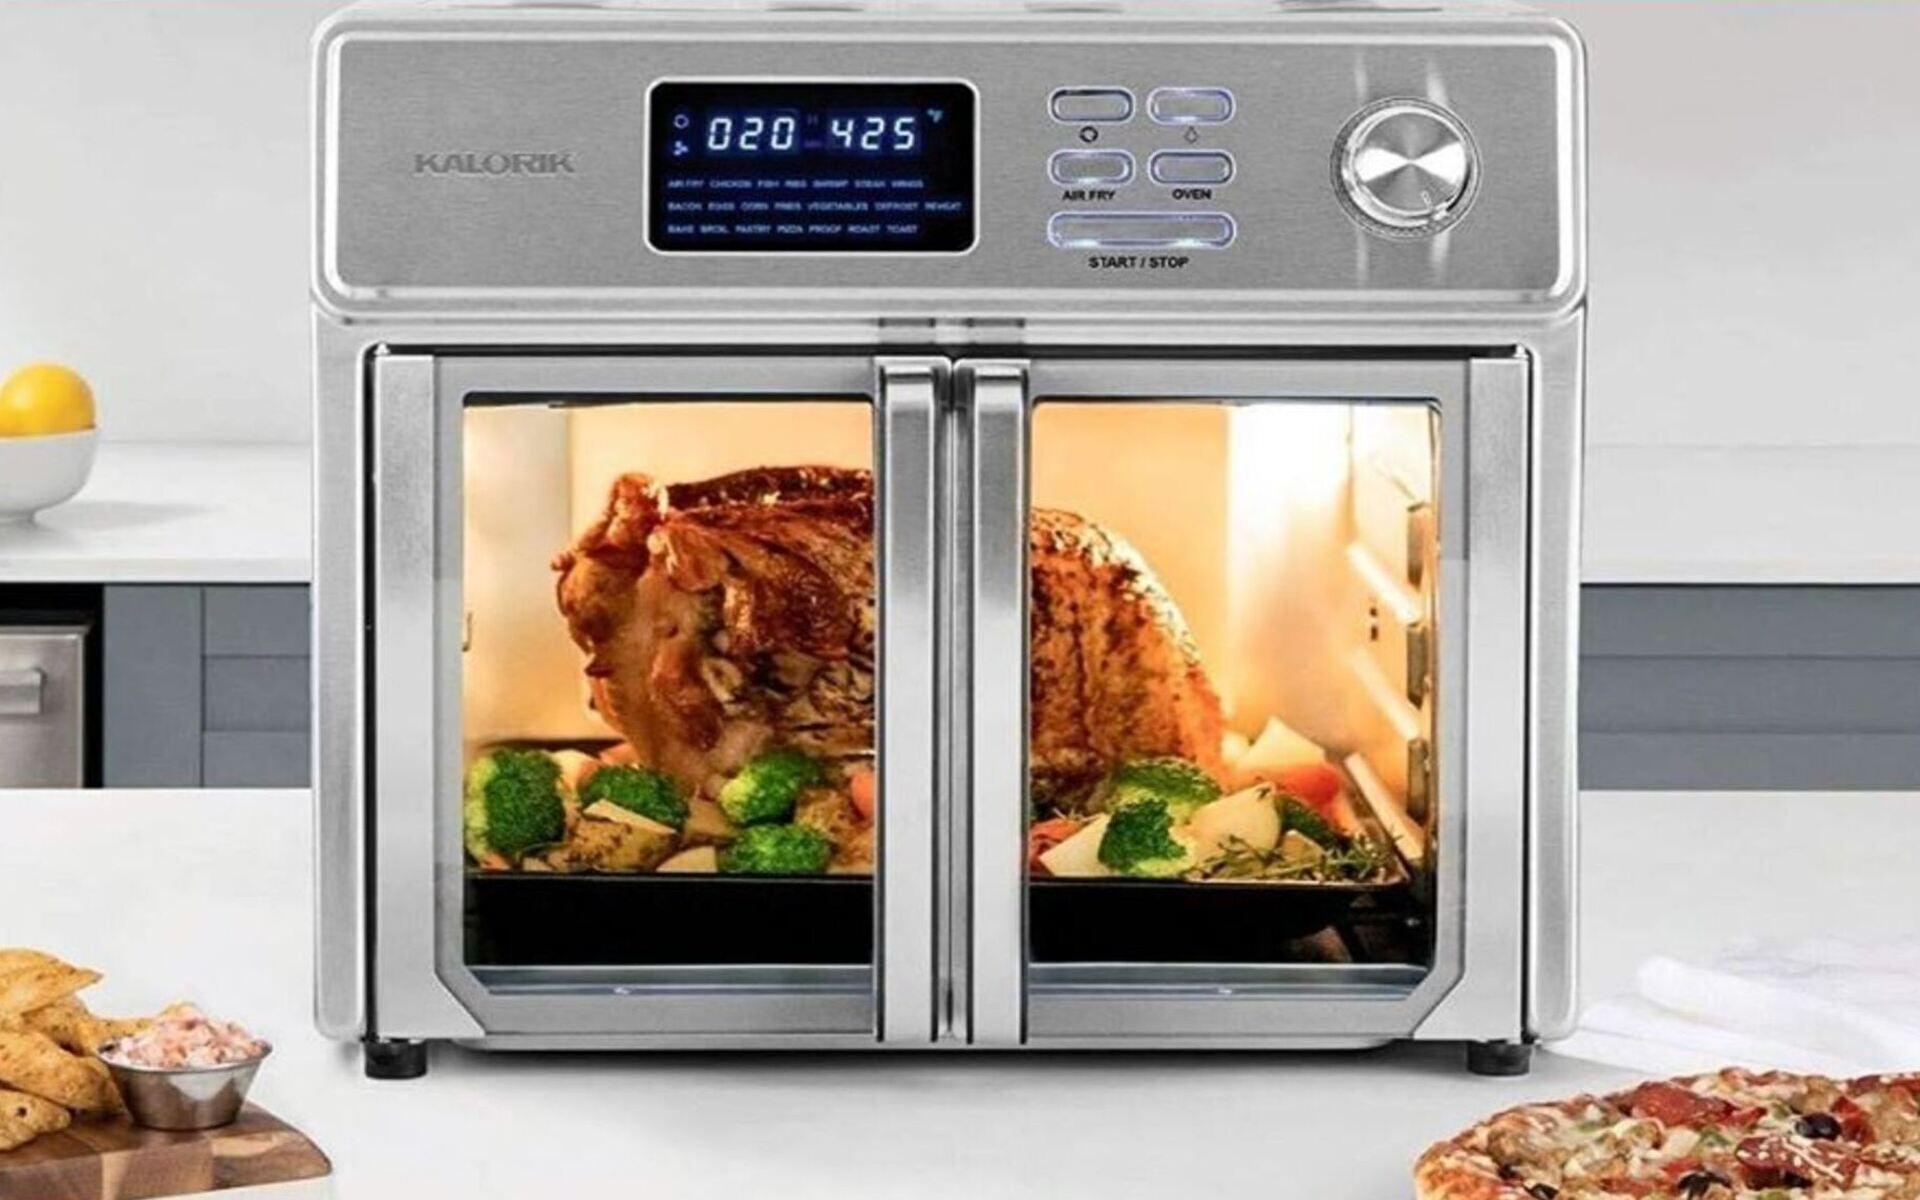 kalorik air fryer oven